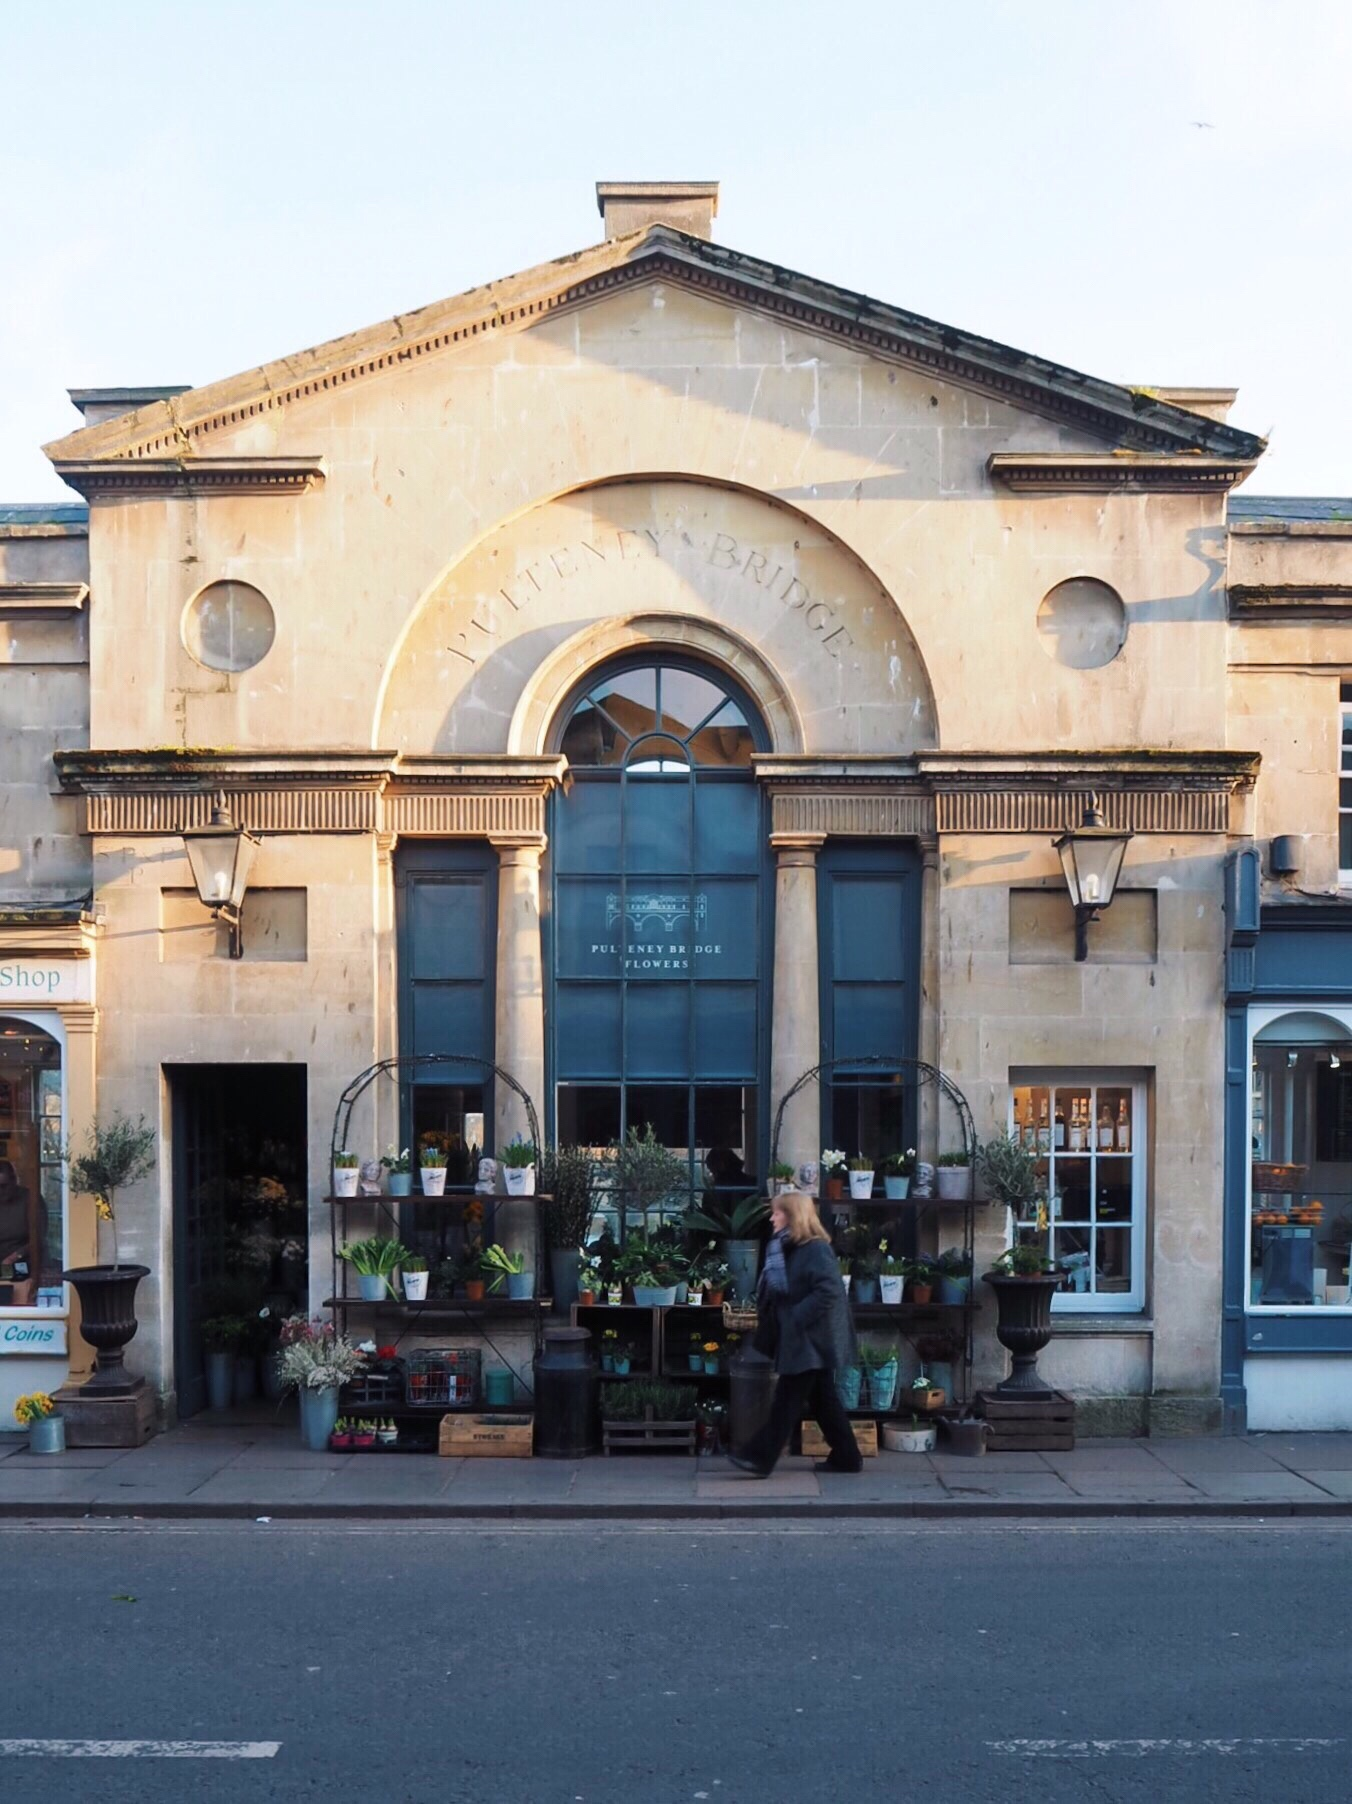 A weekend in Bath